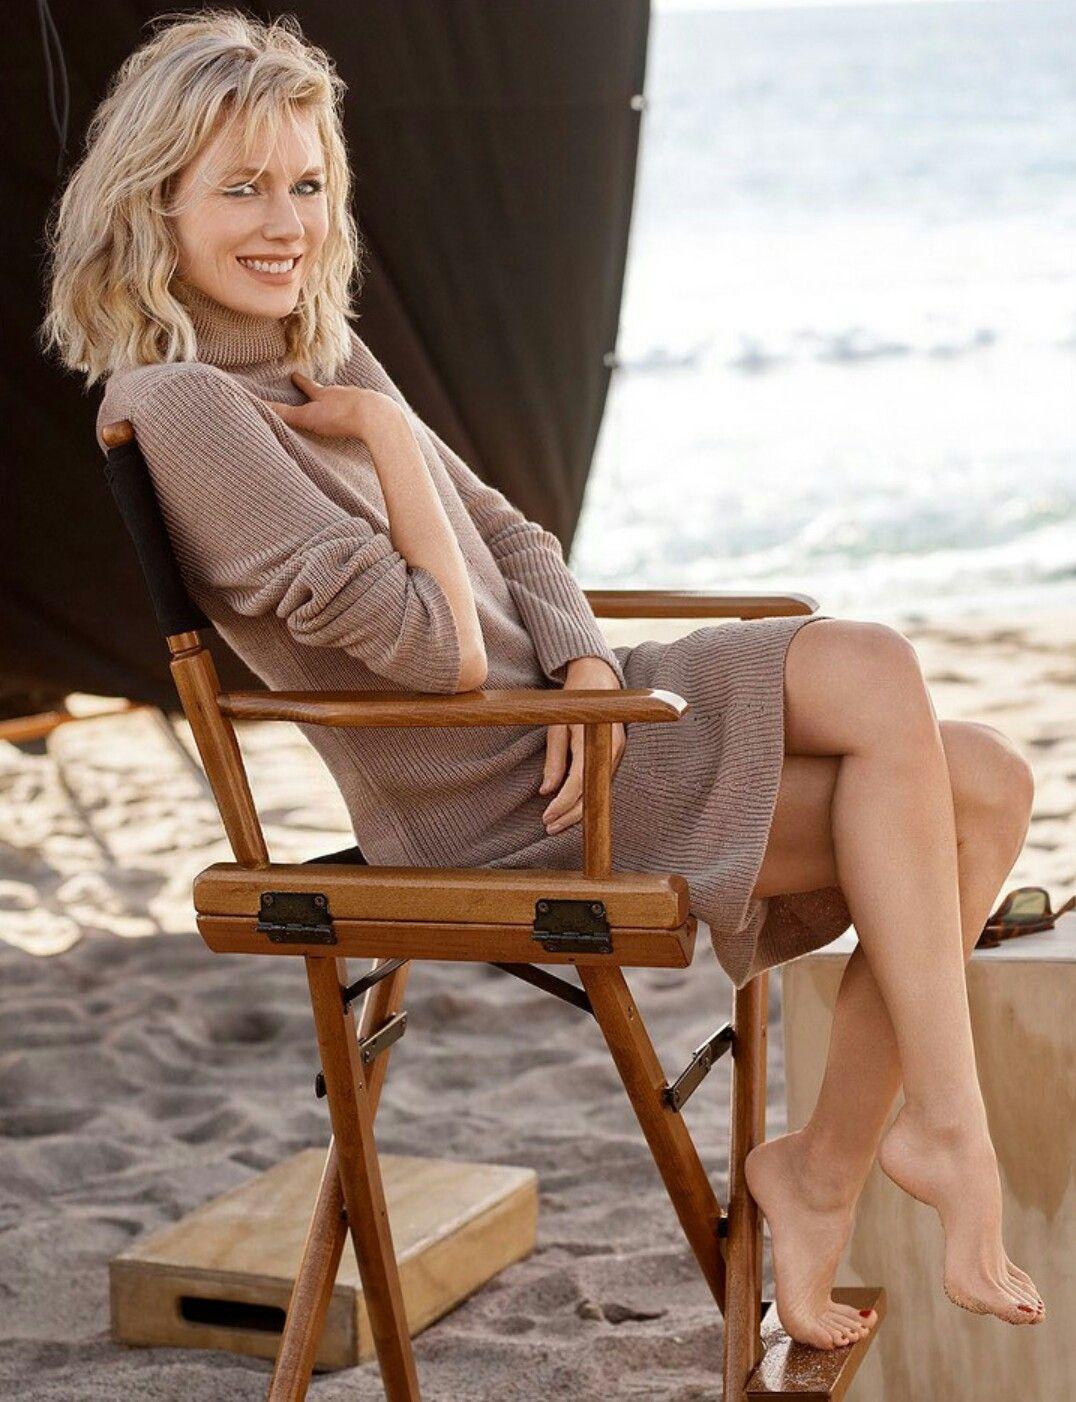 Feet Naomi Watts nudes (45 foto and video), Topless, Paparazzi, Selfie, underwear 2017